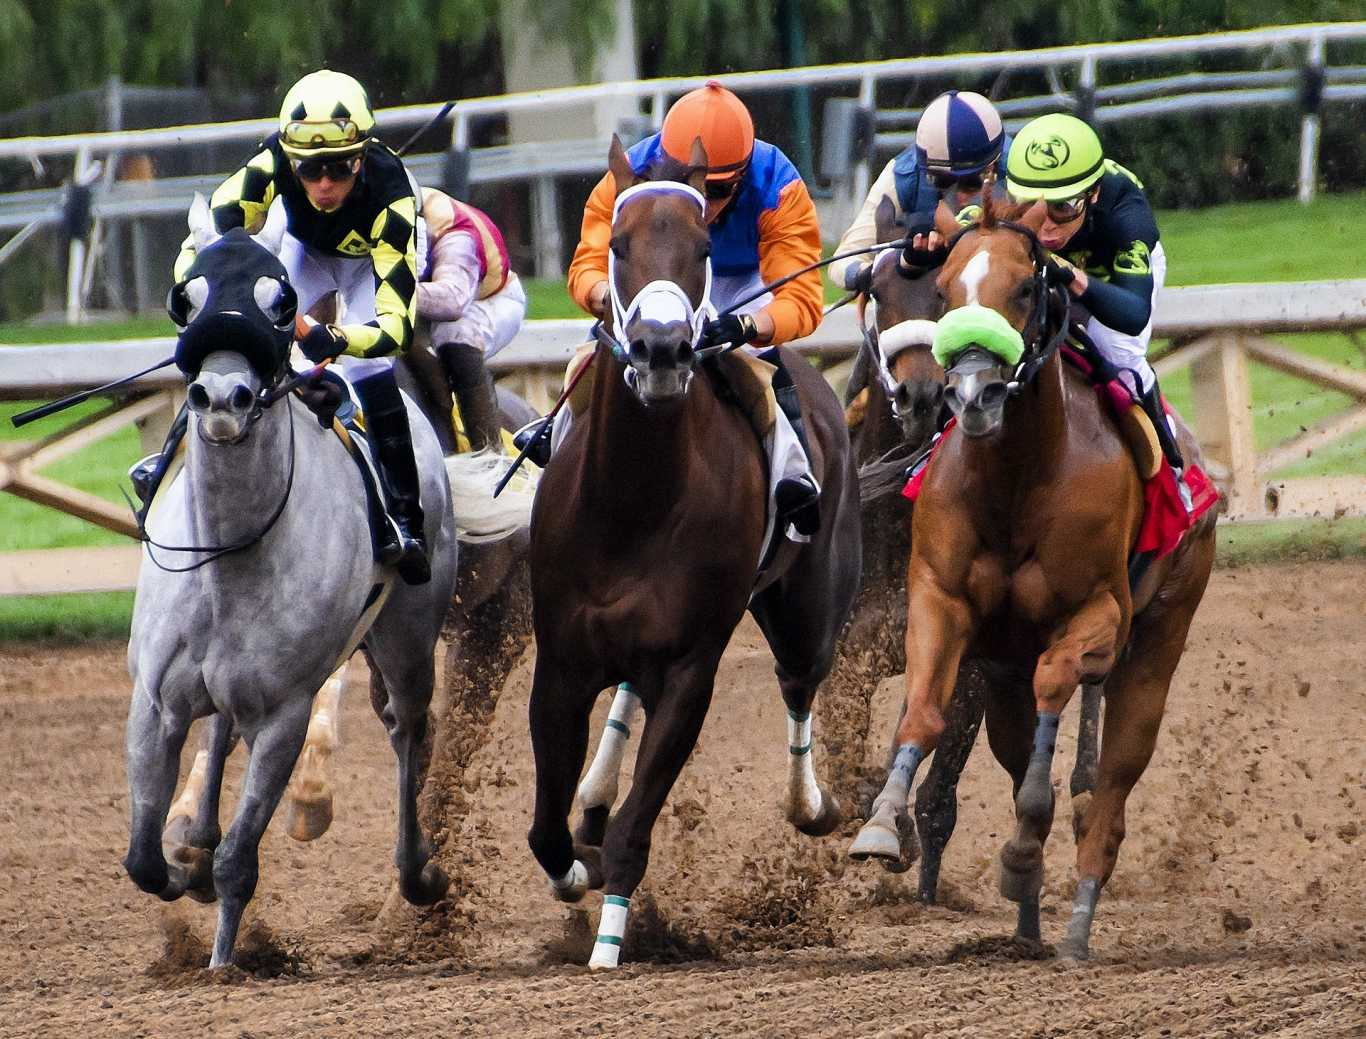 PMU horse racing